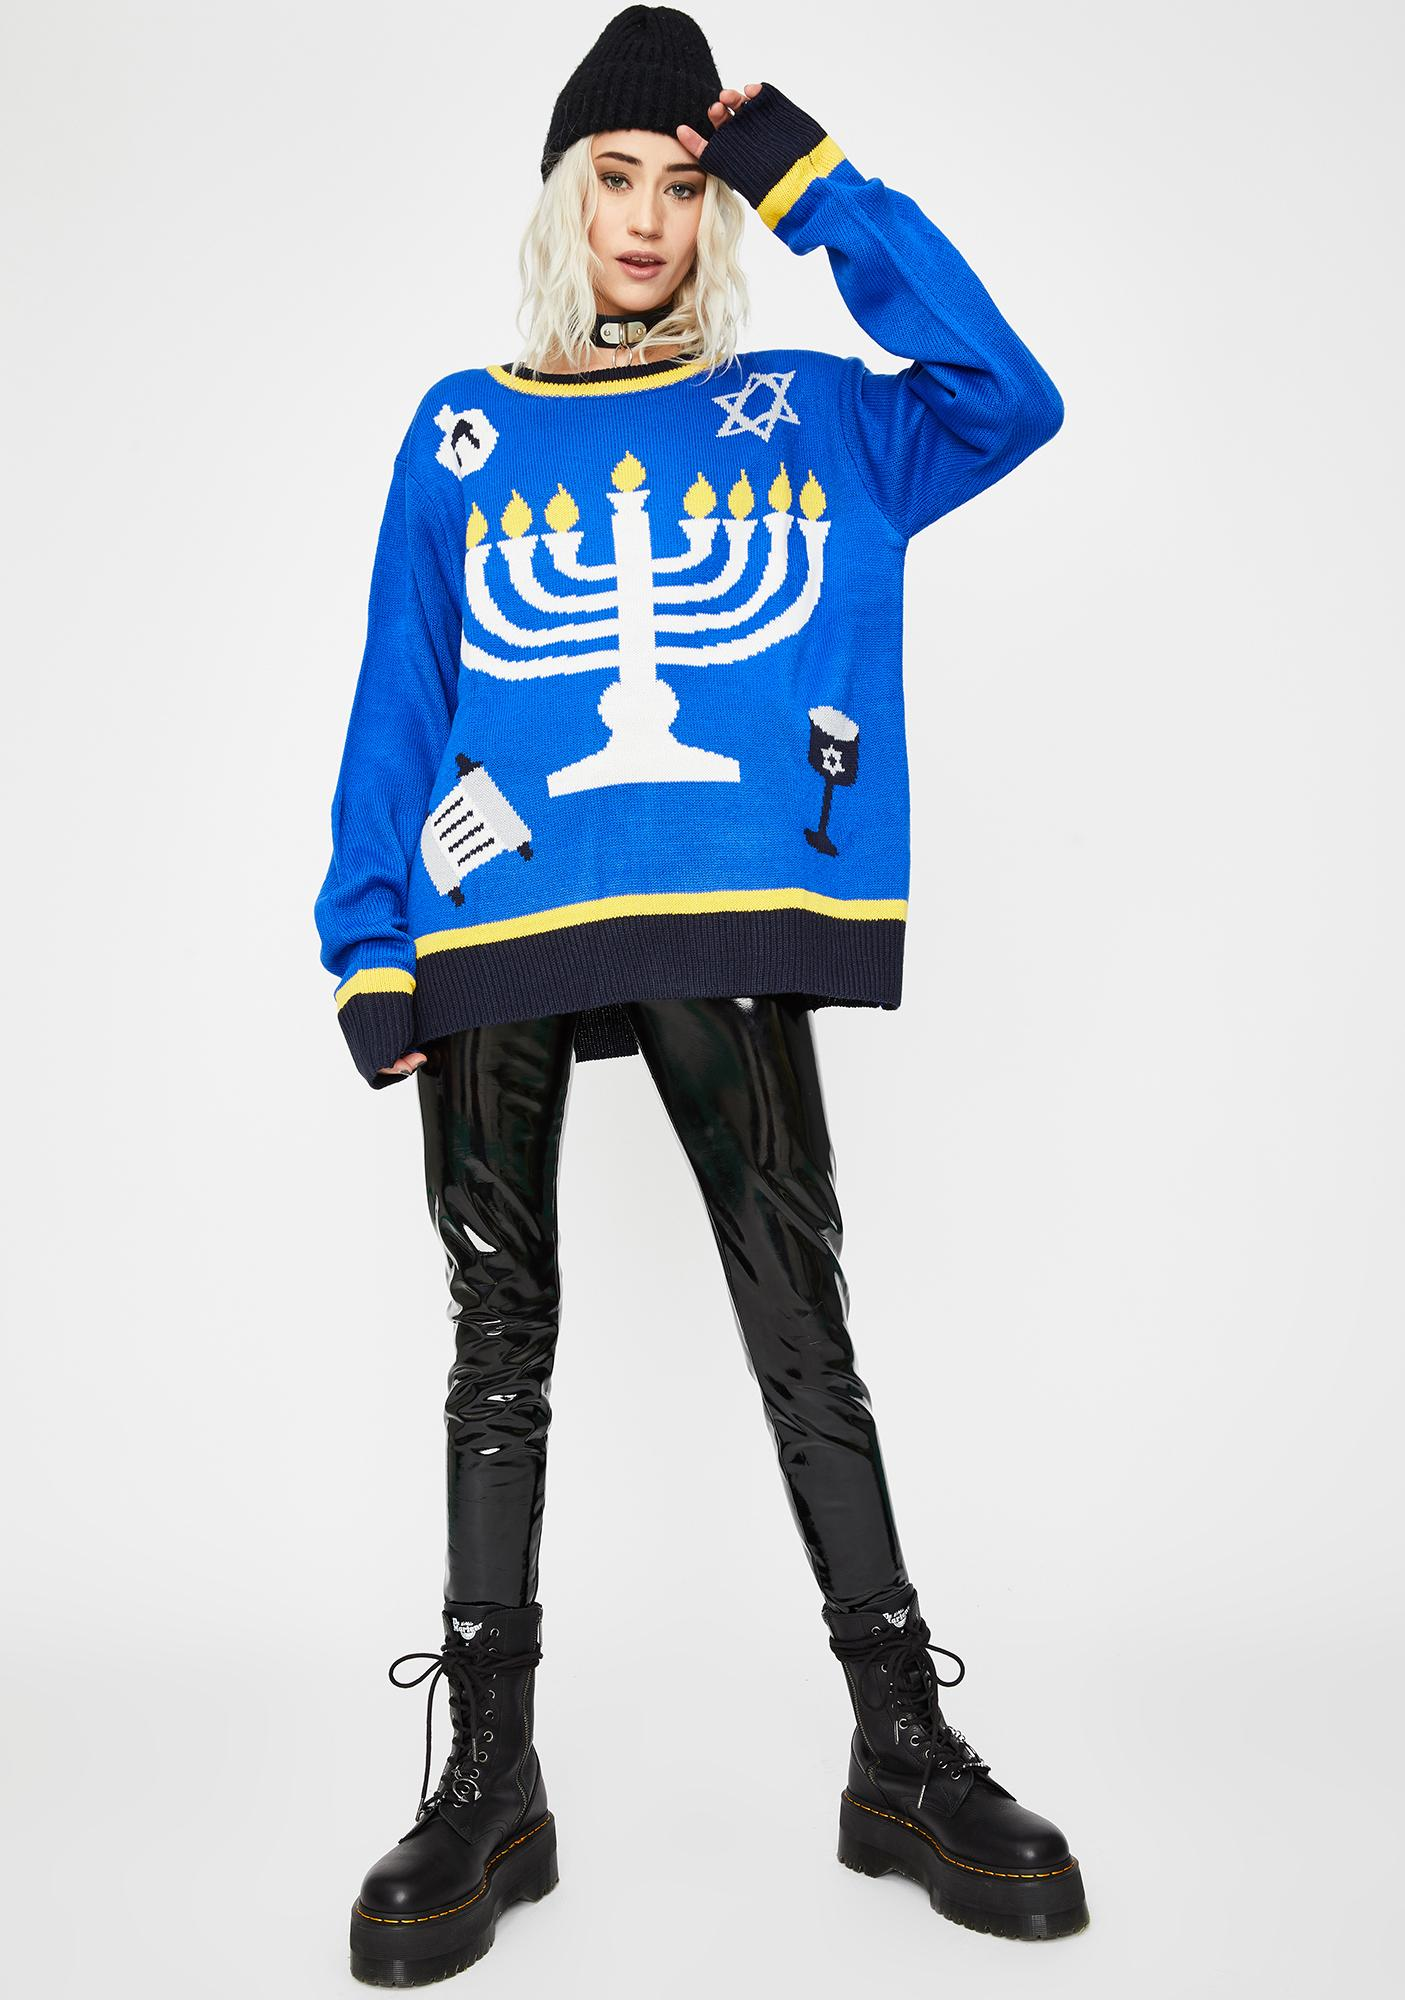 Outrageous Hanukkah Christmas Sweater